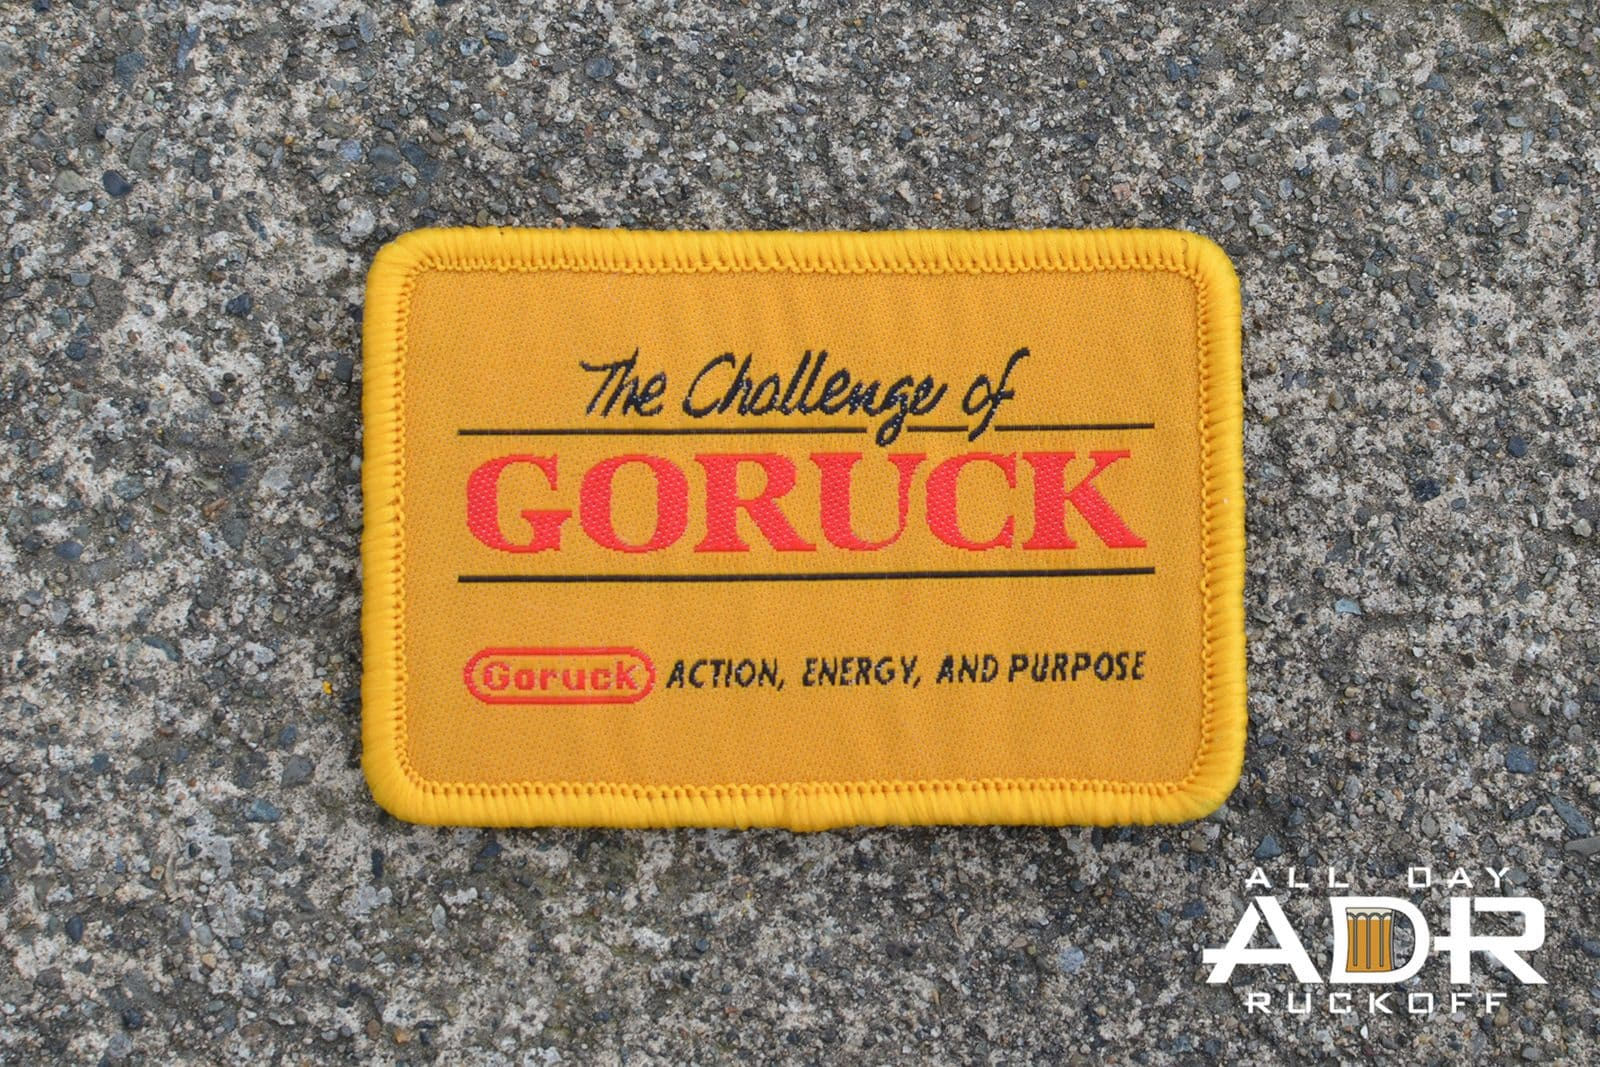 Legend of GORUCK